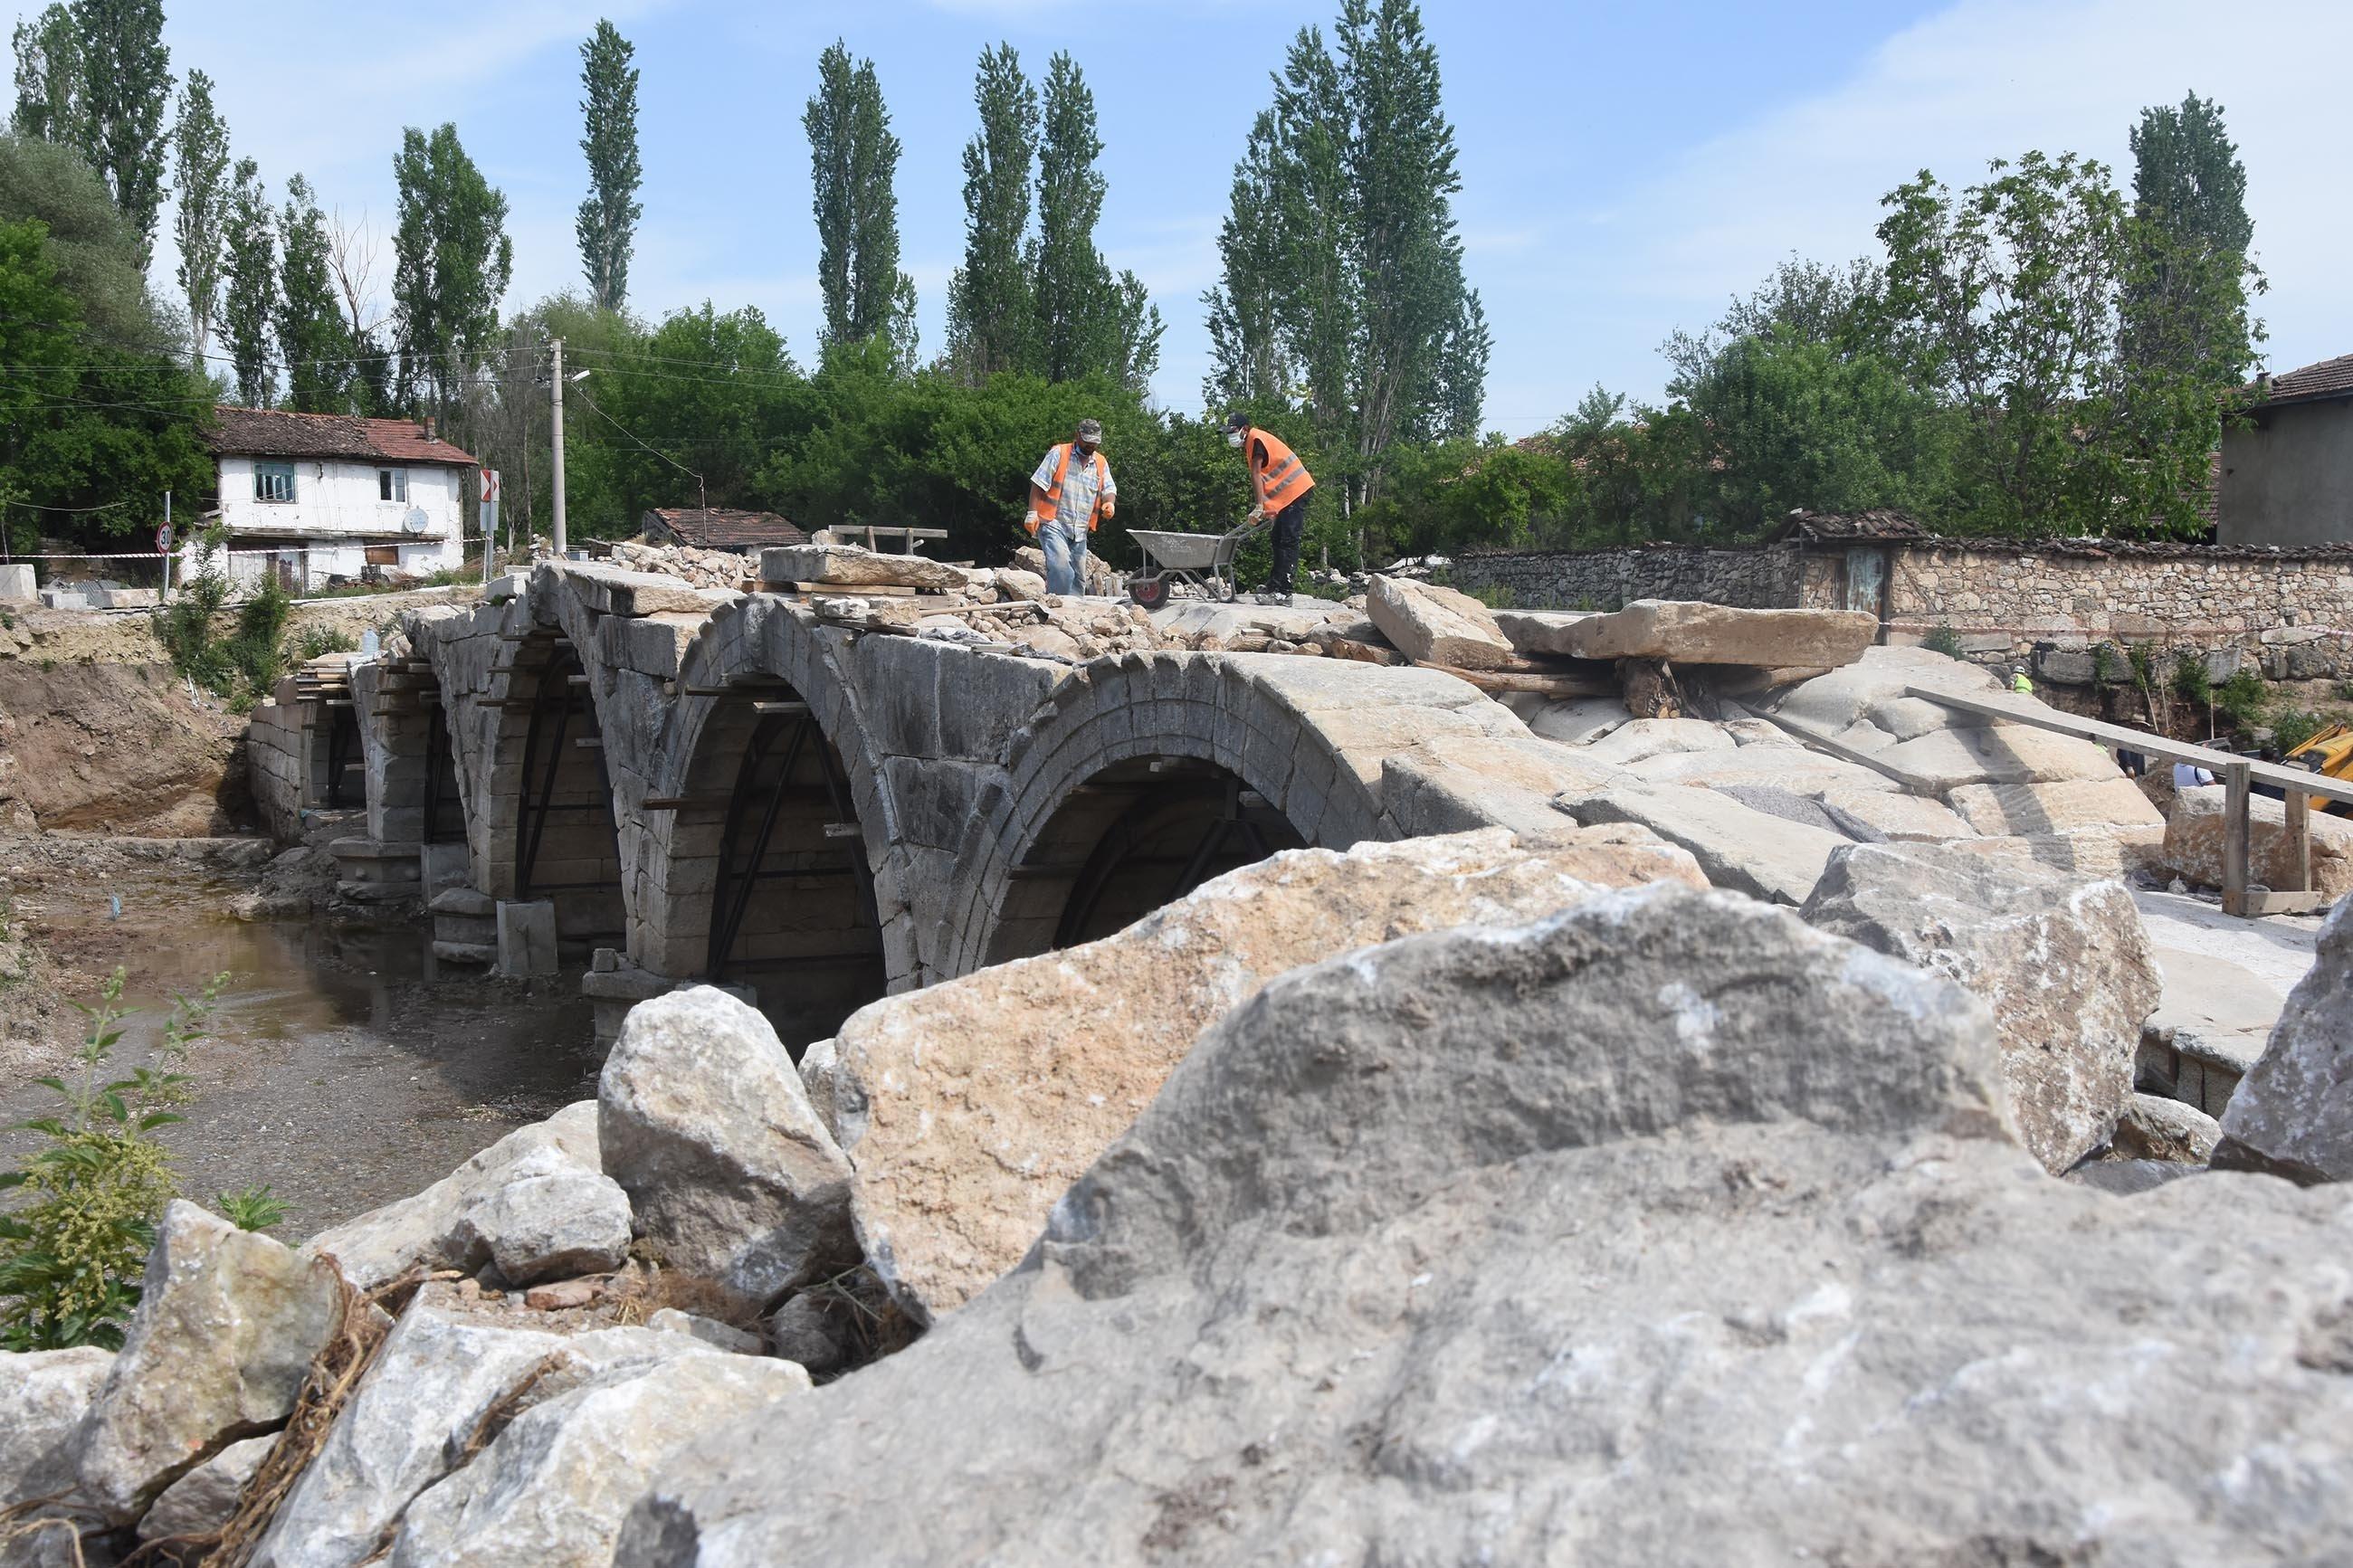 Specialists work on a historic Roman bridge that spans Kocaçay creek near the ancient city of Aizanoi in Kütahya, Turkey, May 30, 2021. (DHA Photo)